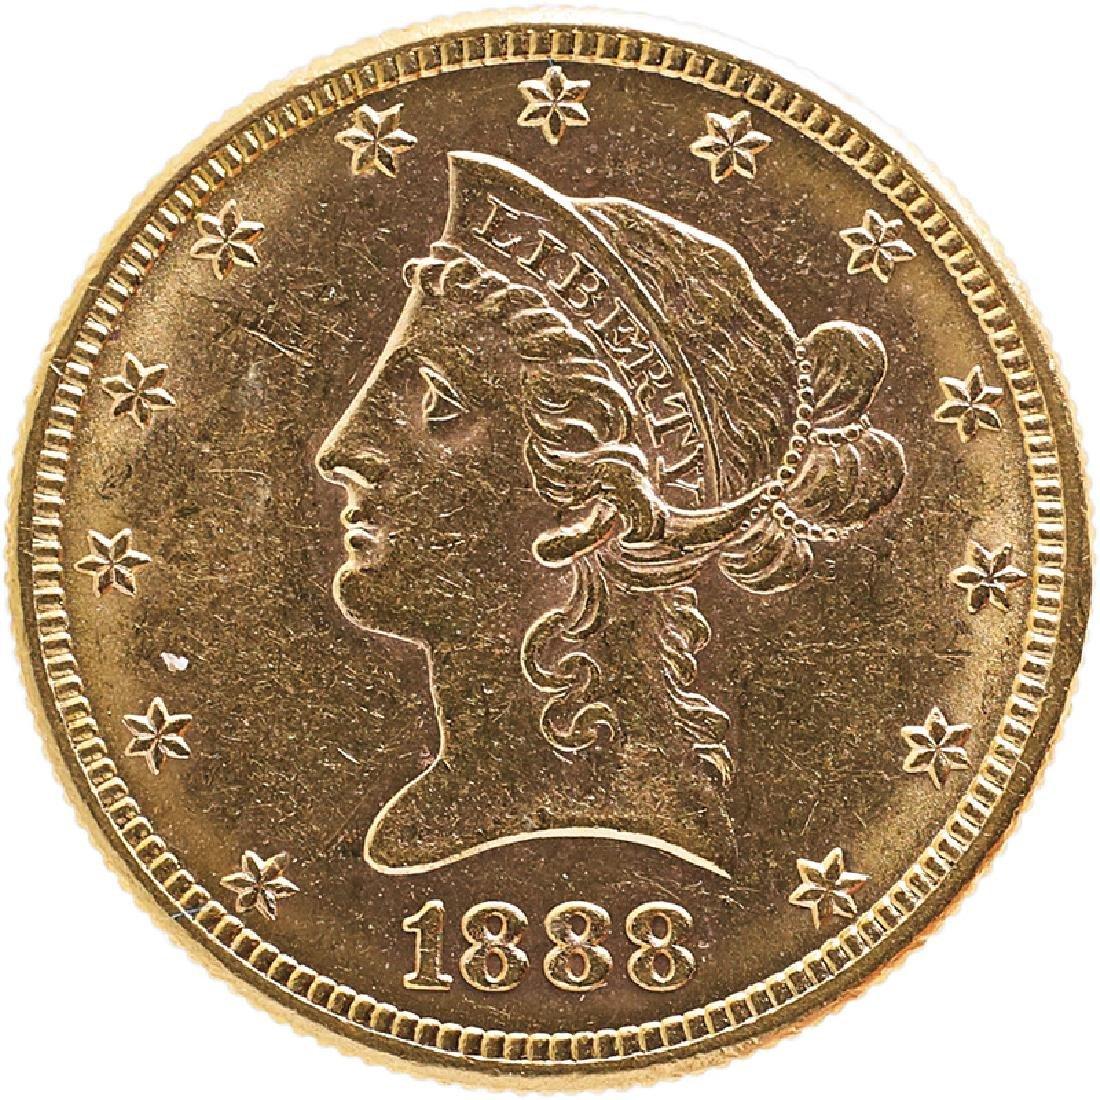 U.S. 1888-S LIBERTY $10 GOLD COIN